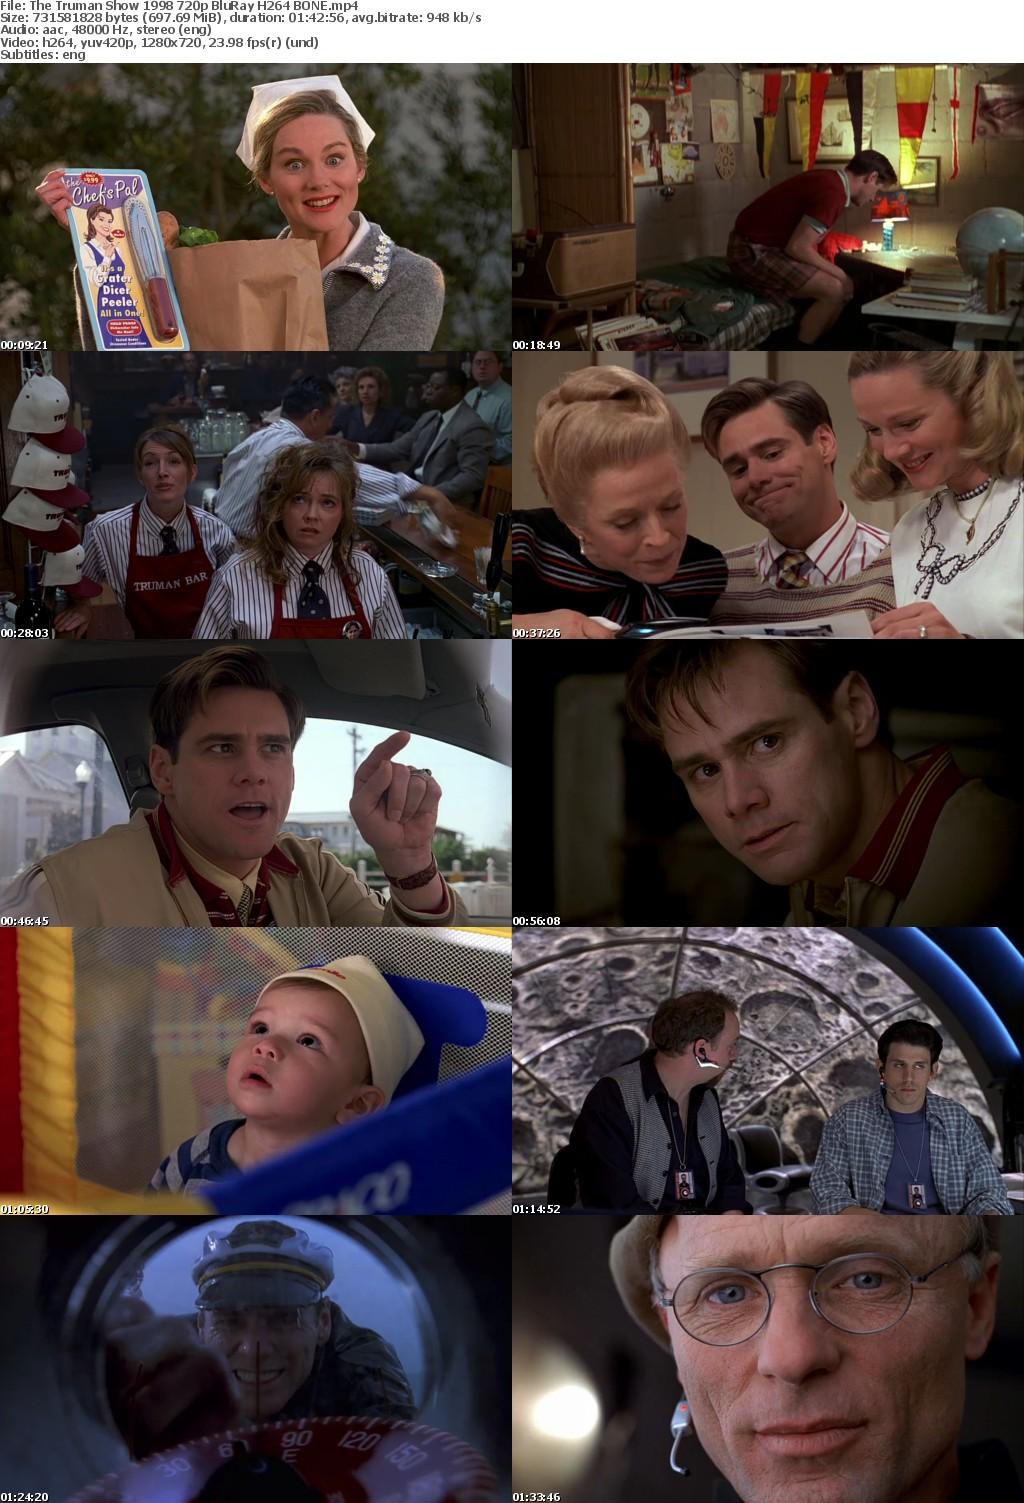 The Truman Show (1998) 720p BluRay H264 BONE